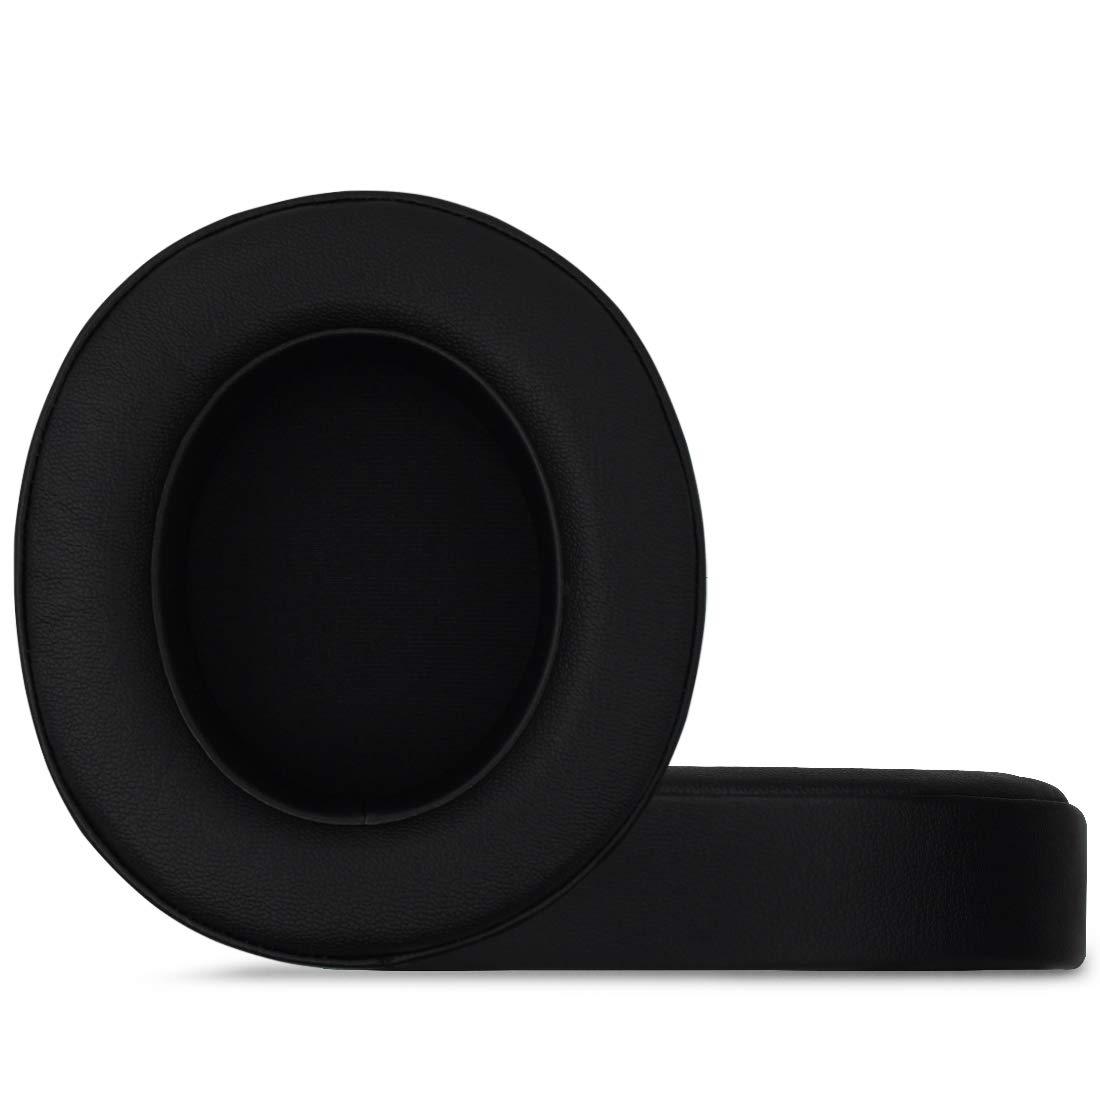 Almohadillas Auriculares RAZER KRAKEN PRO V2 EAR CUSHION -3Z